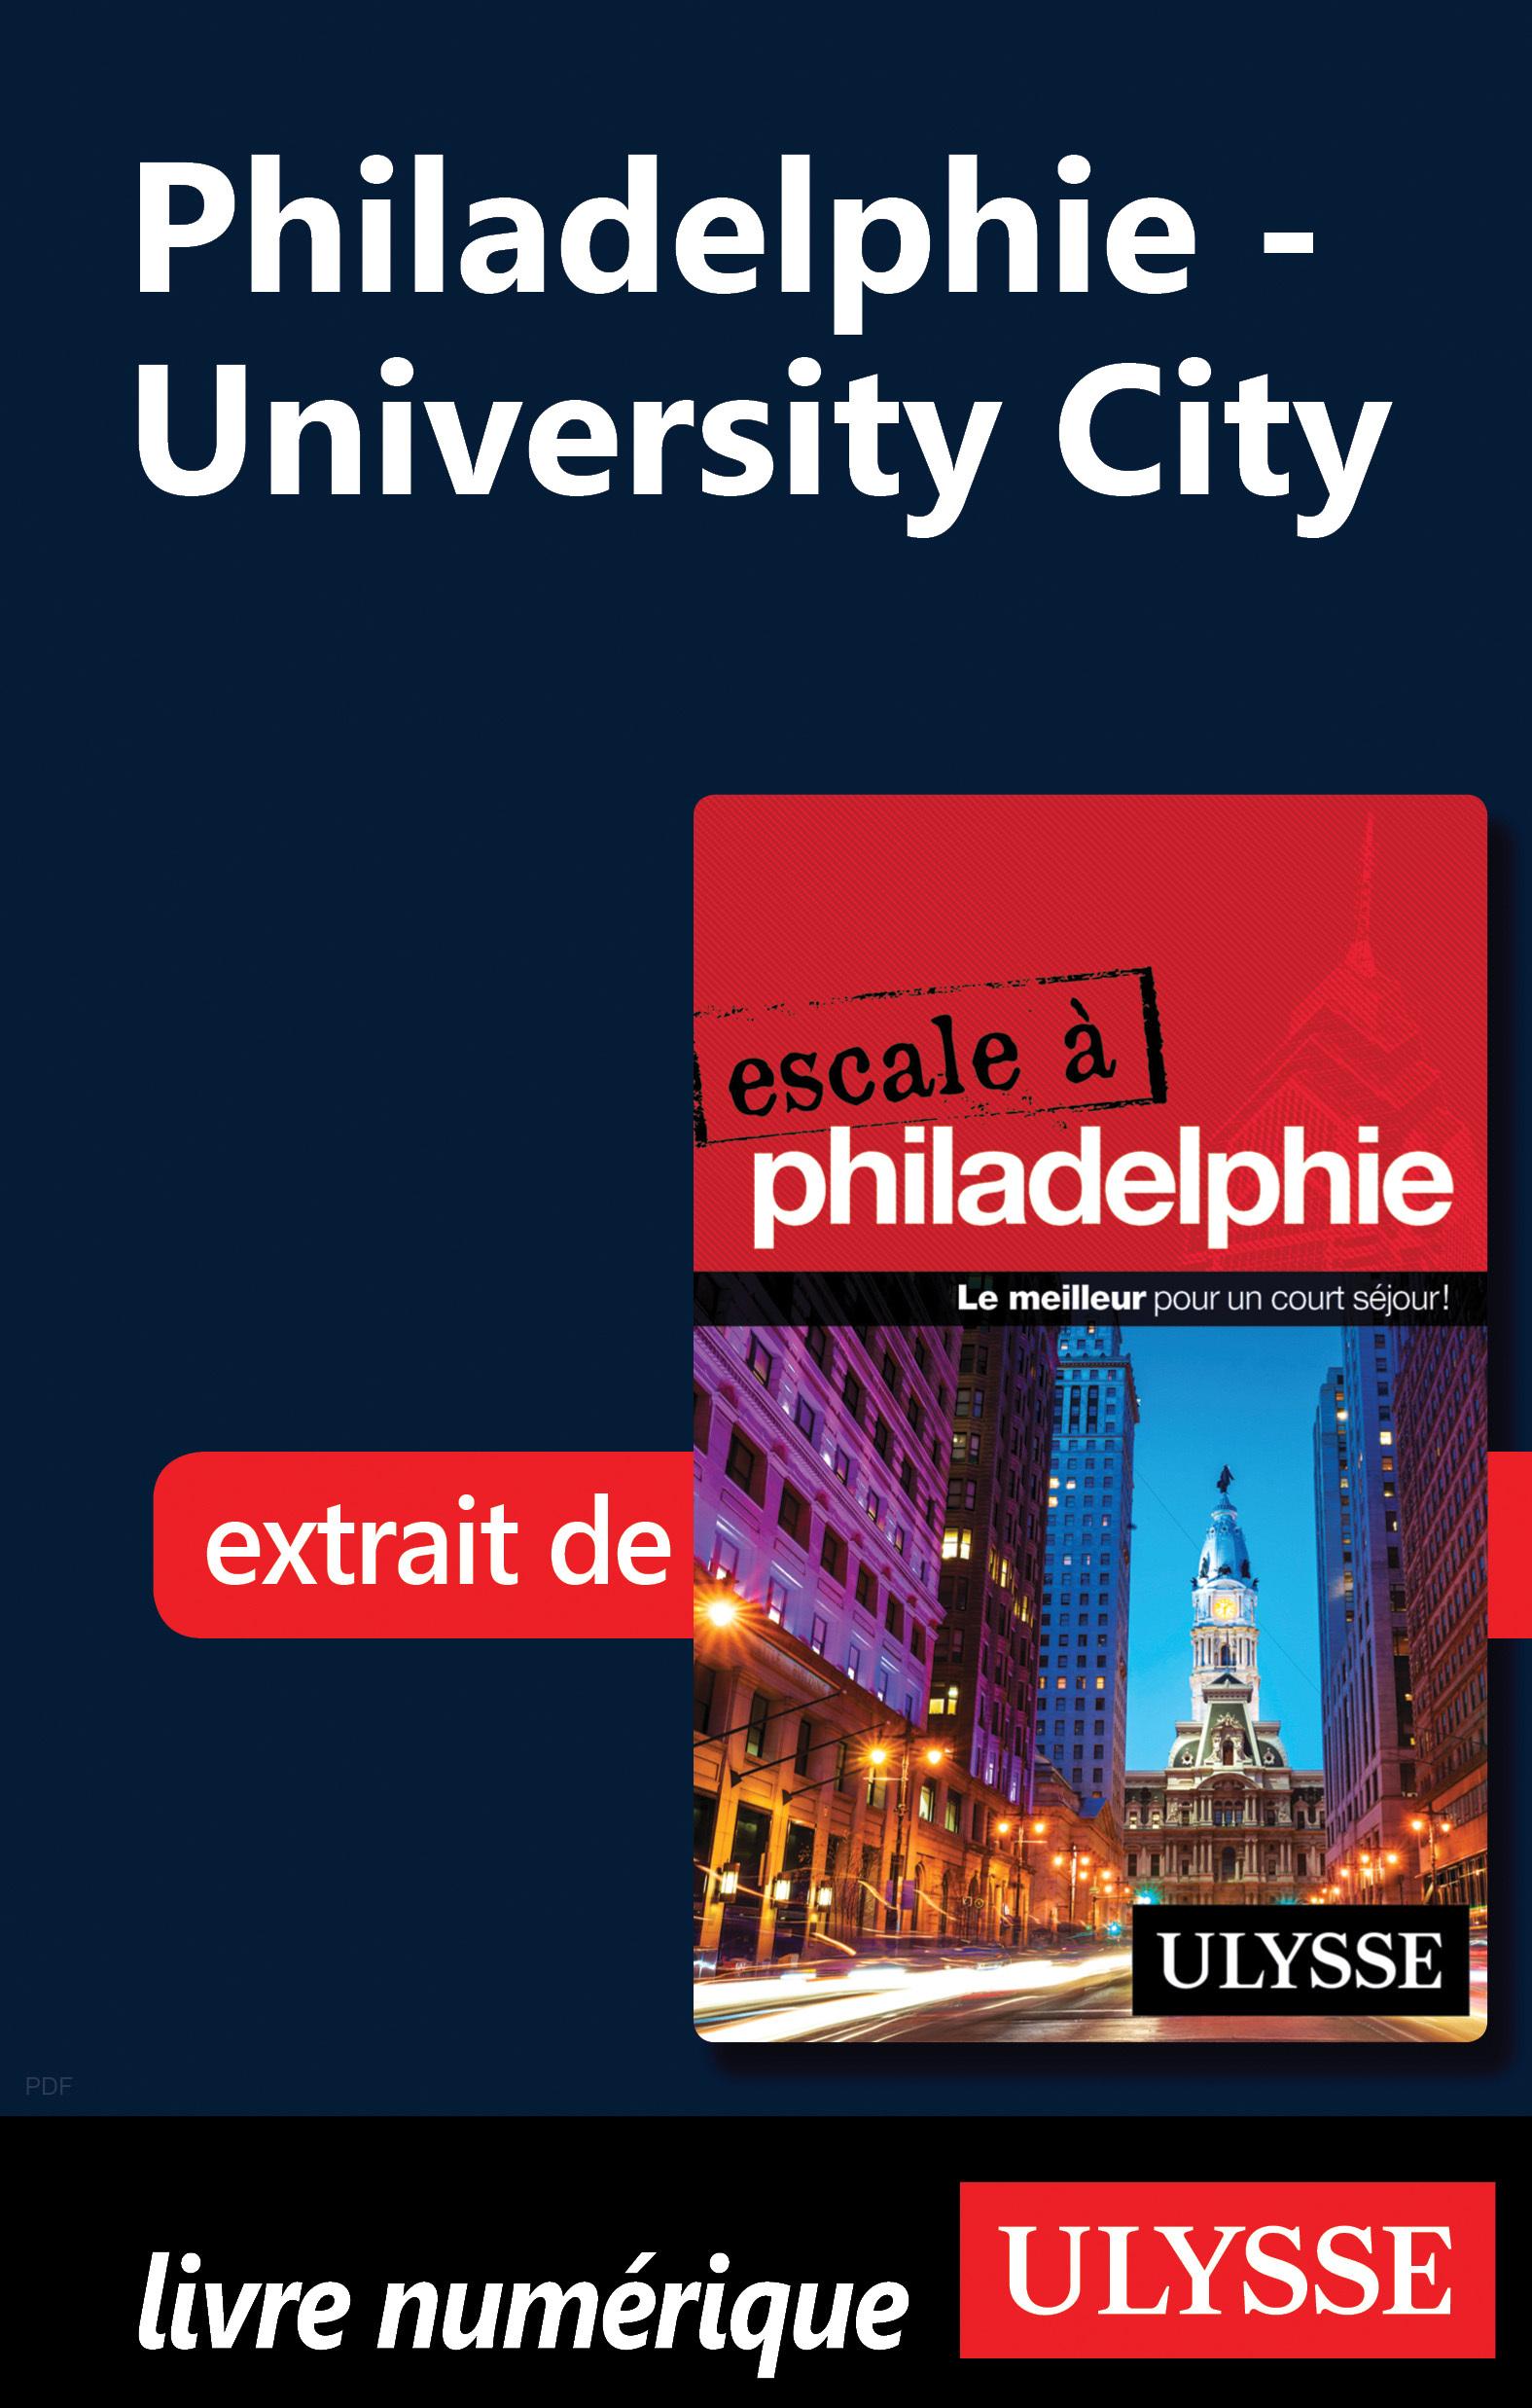 Philadelphie - University City